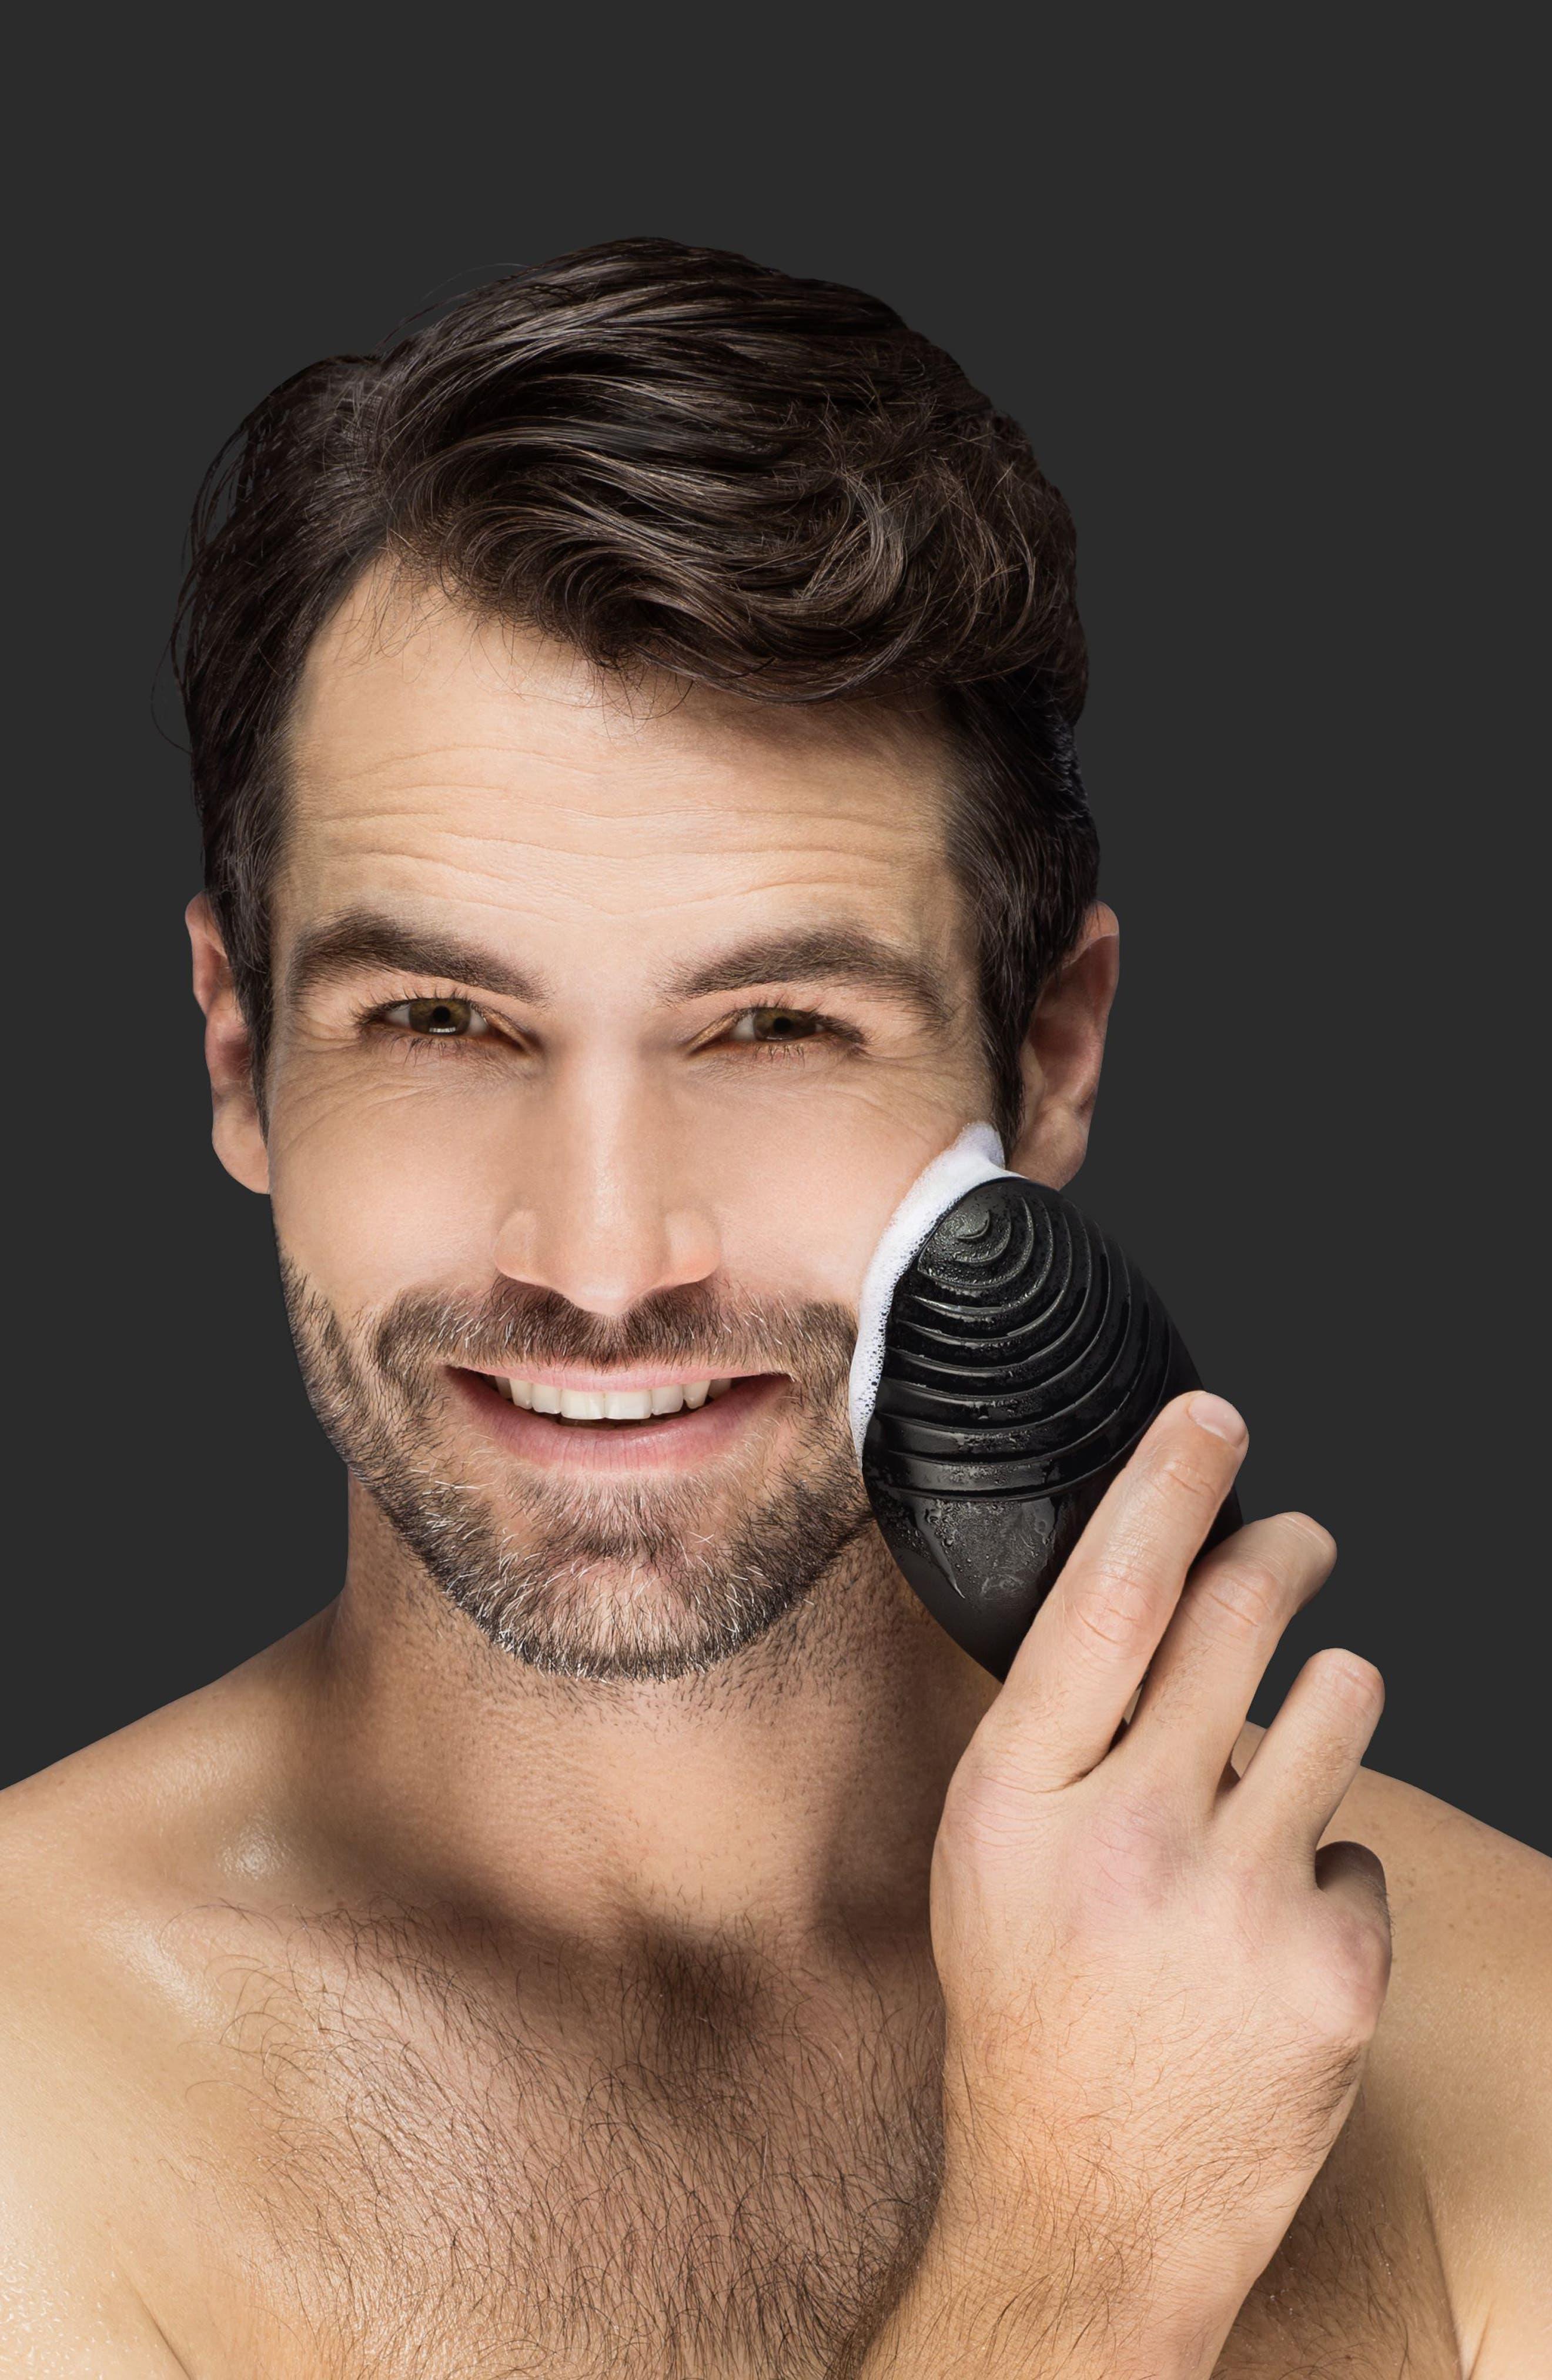 LUNA<sup>™</sup> 2 for Men Facial Cleansing Device,                             Alternate thumbnail 4, color,                             No Color